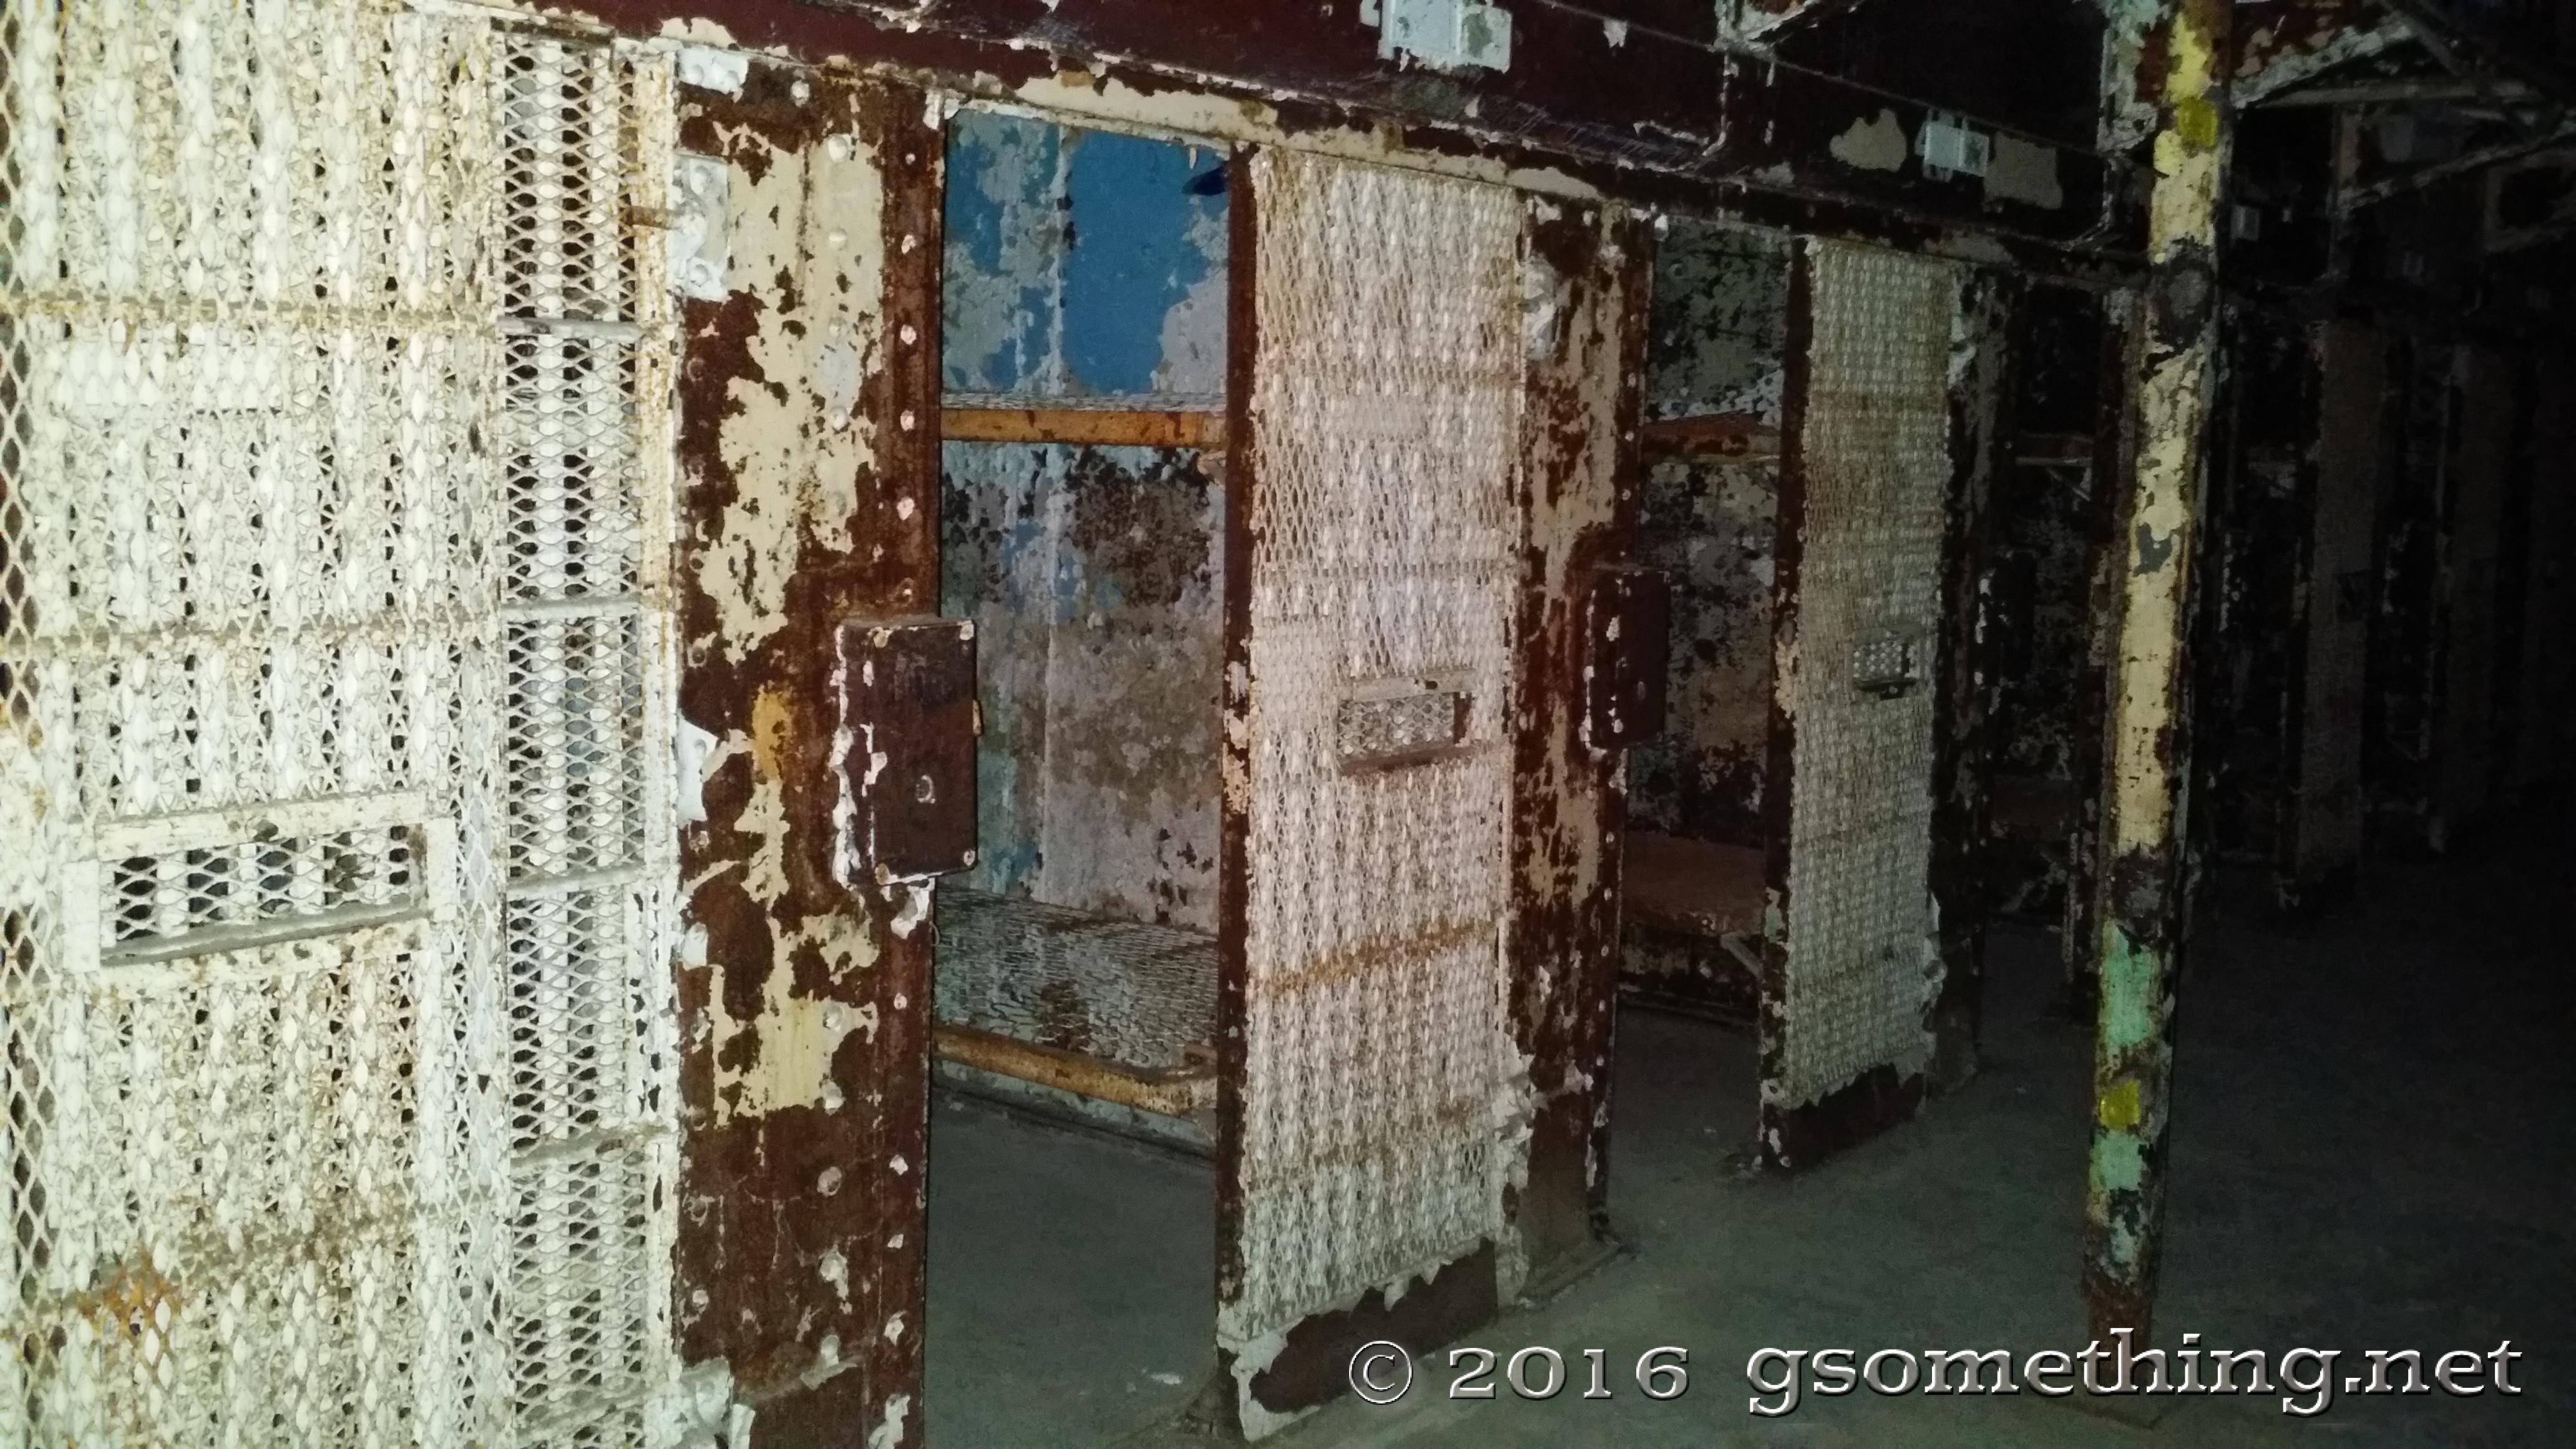 mansfield_reformatory_2nd_trip_157.jpg